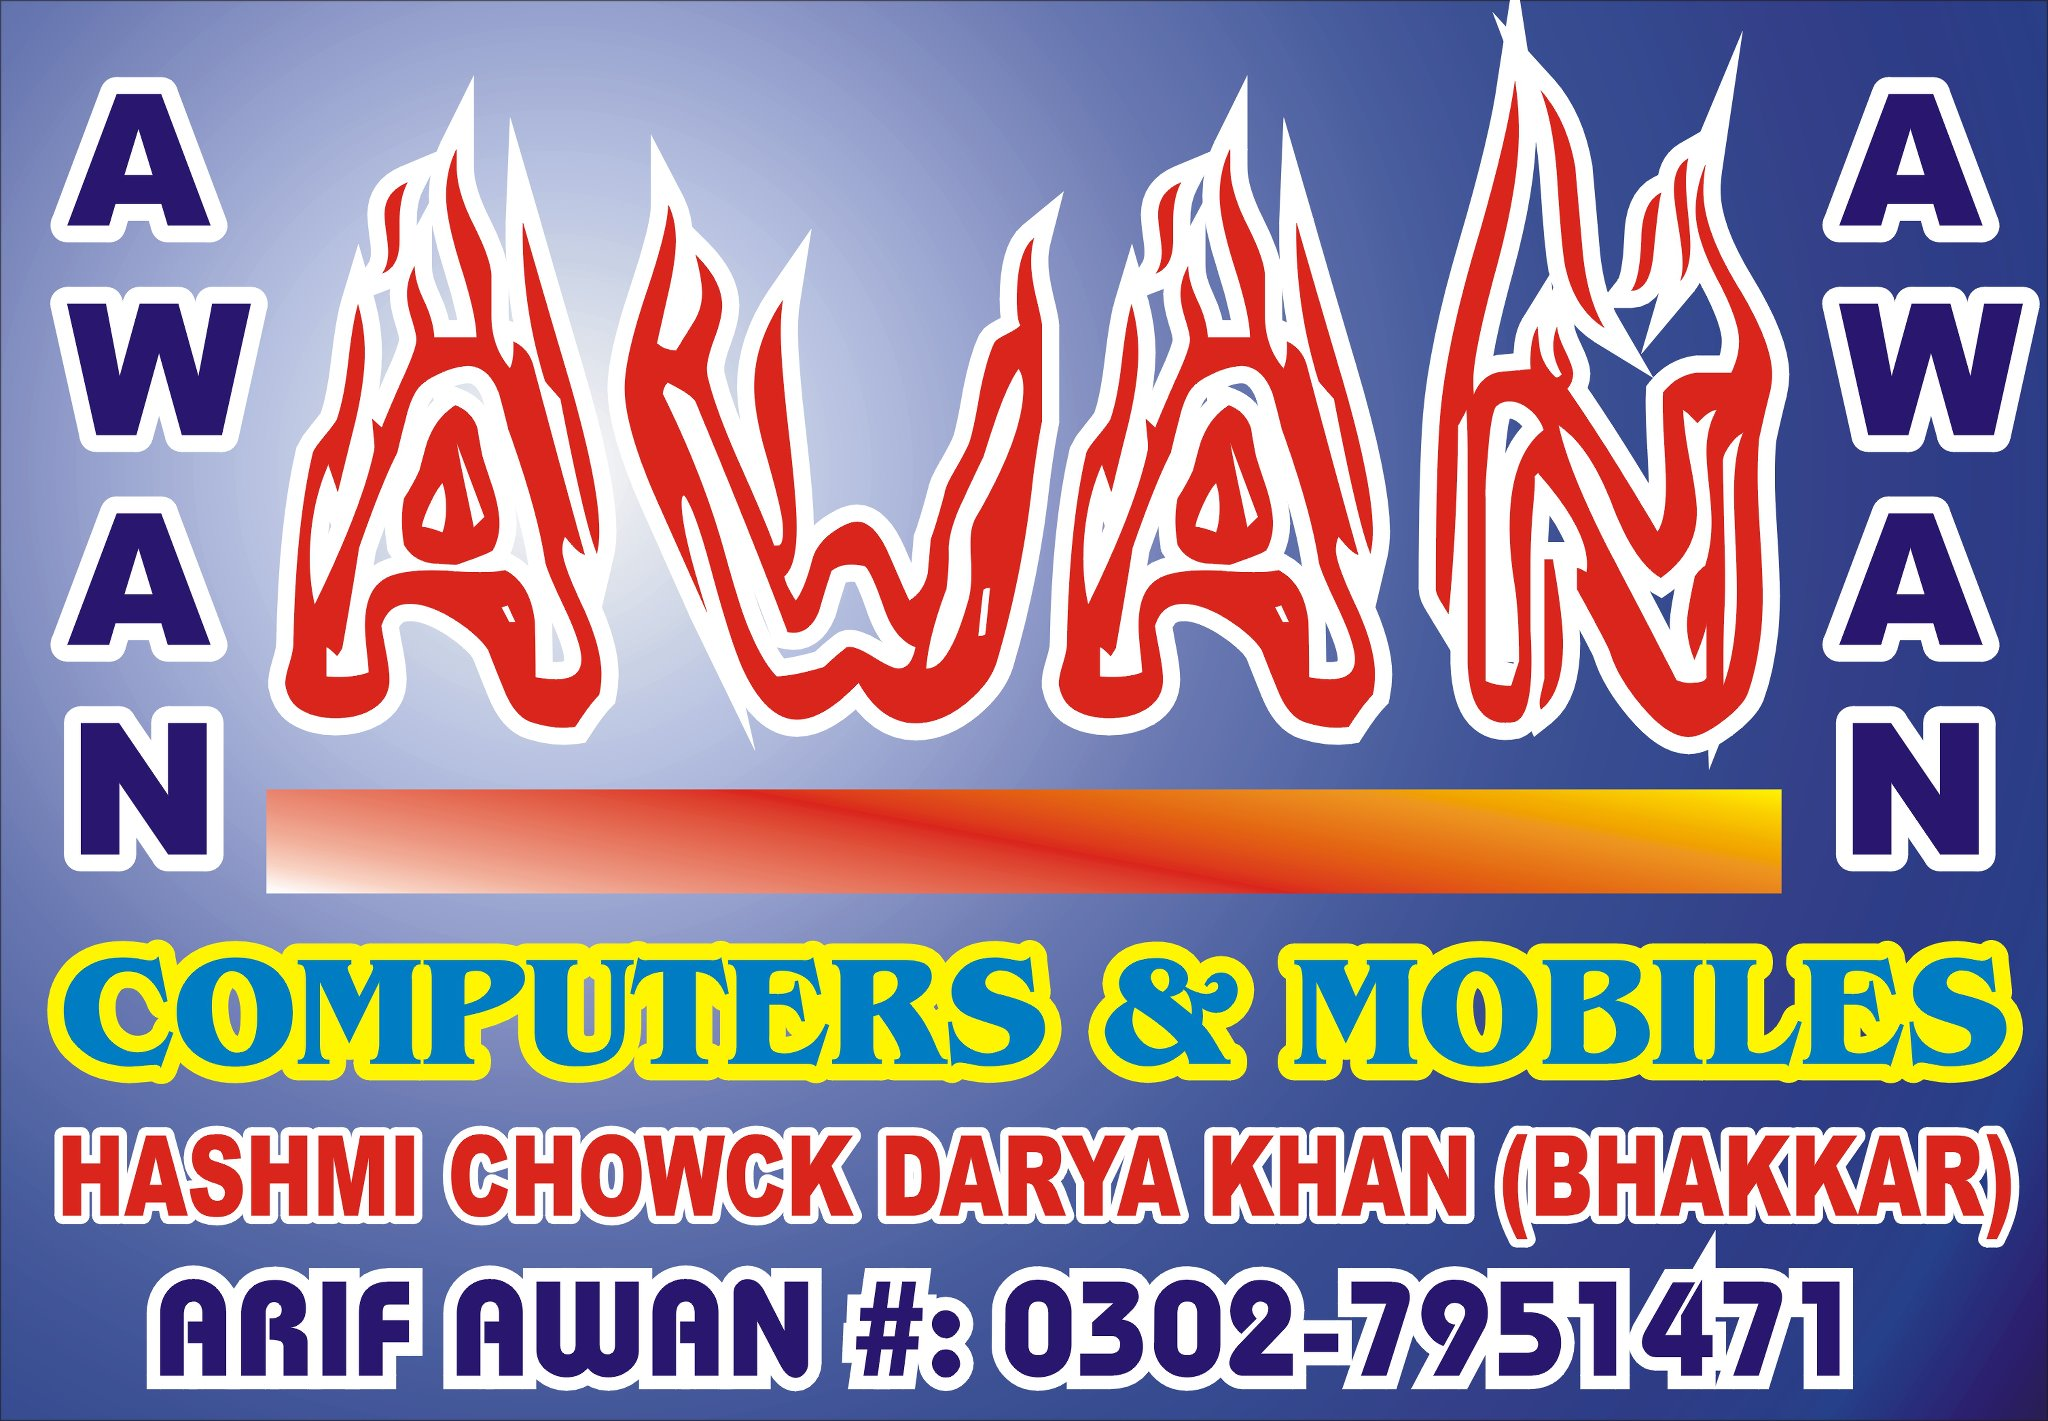 Awan Computers DK shop cover